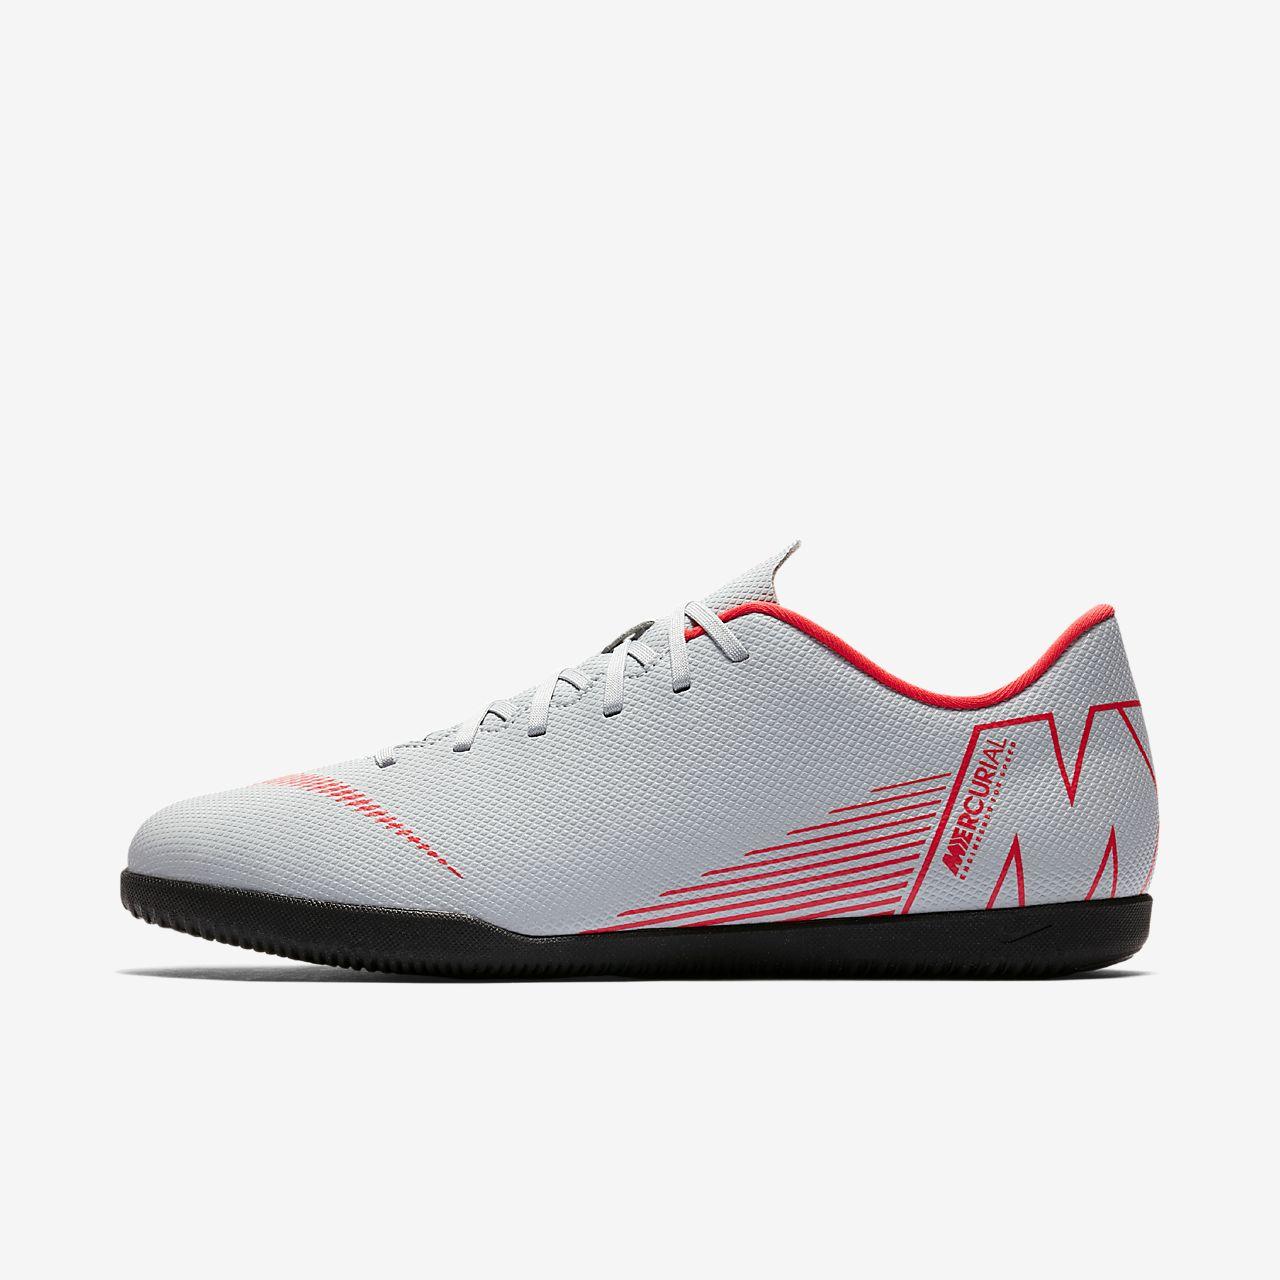 Vapor Ic Mercurialx En Salle Chaussure Nike Xii Club De Football vn0mwOPNy8